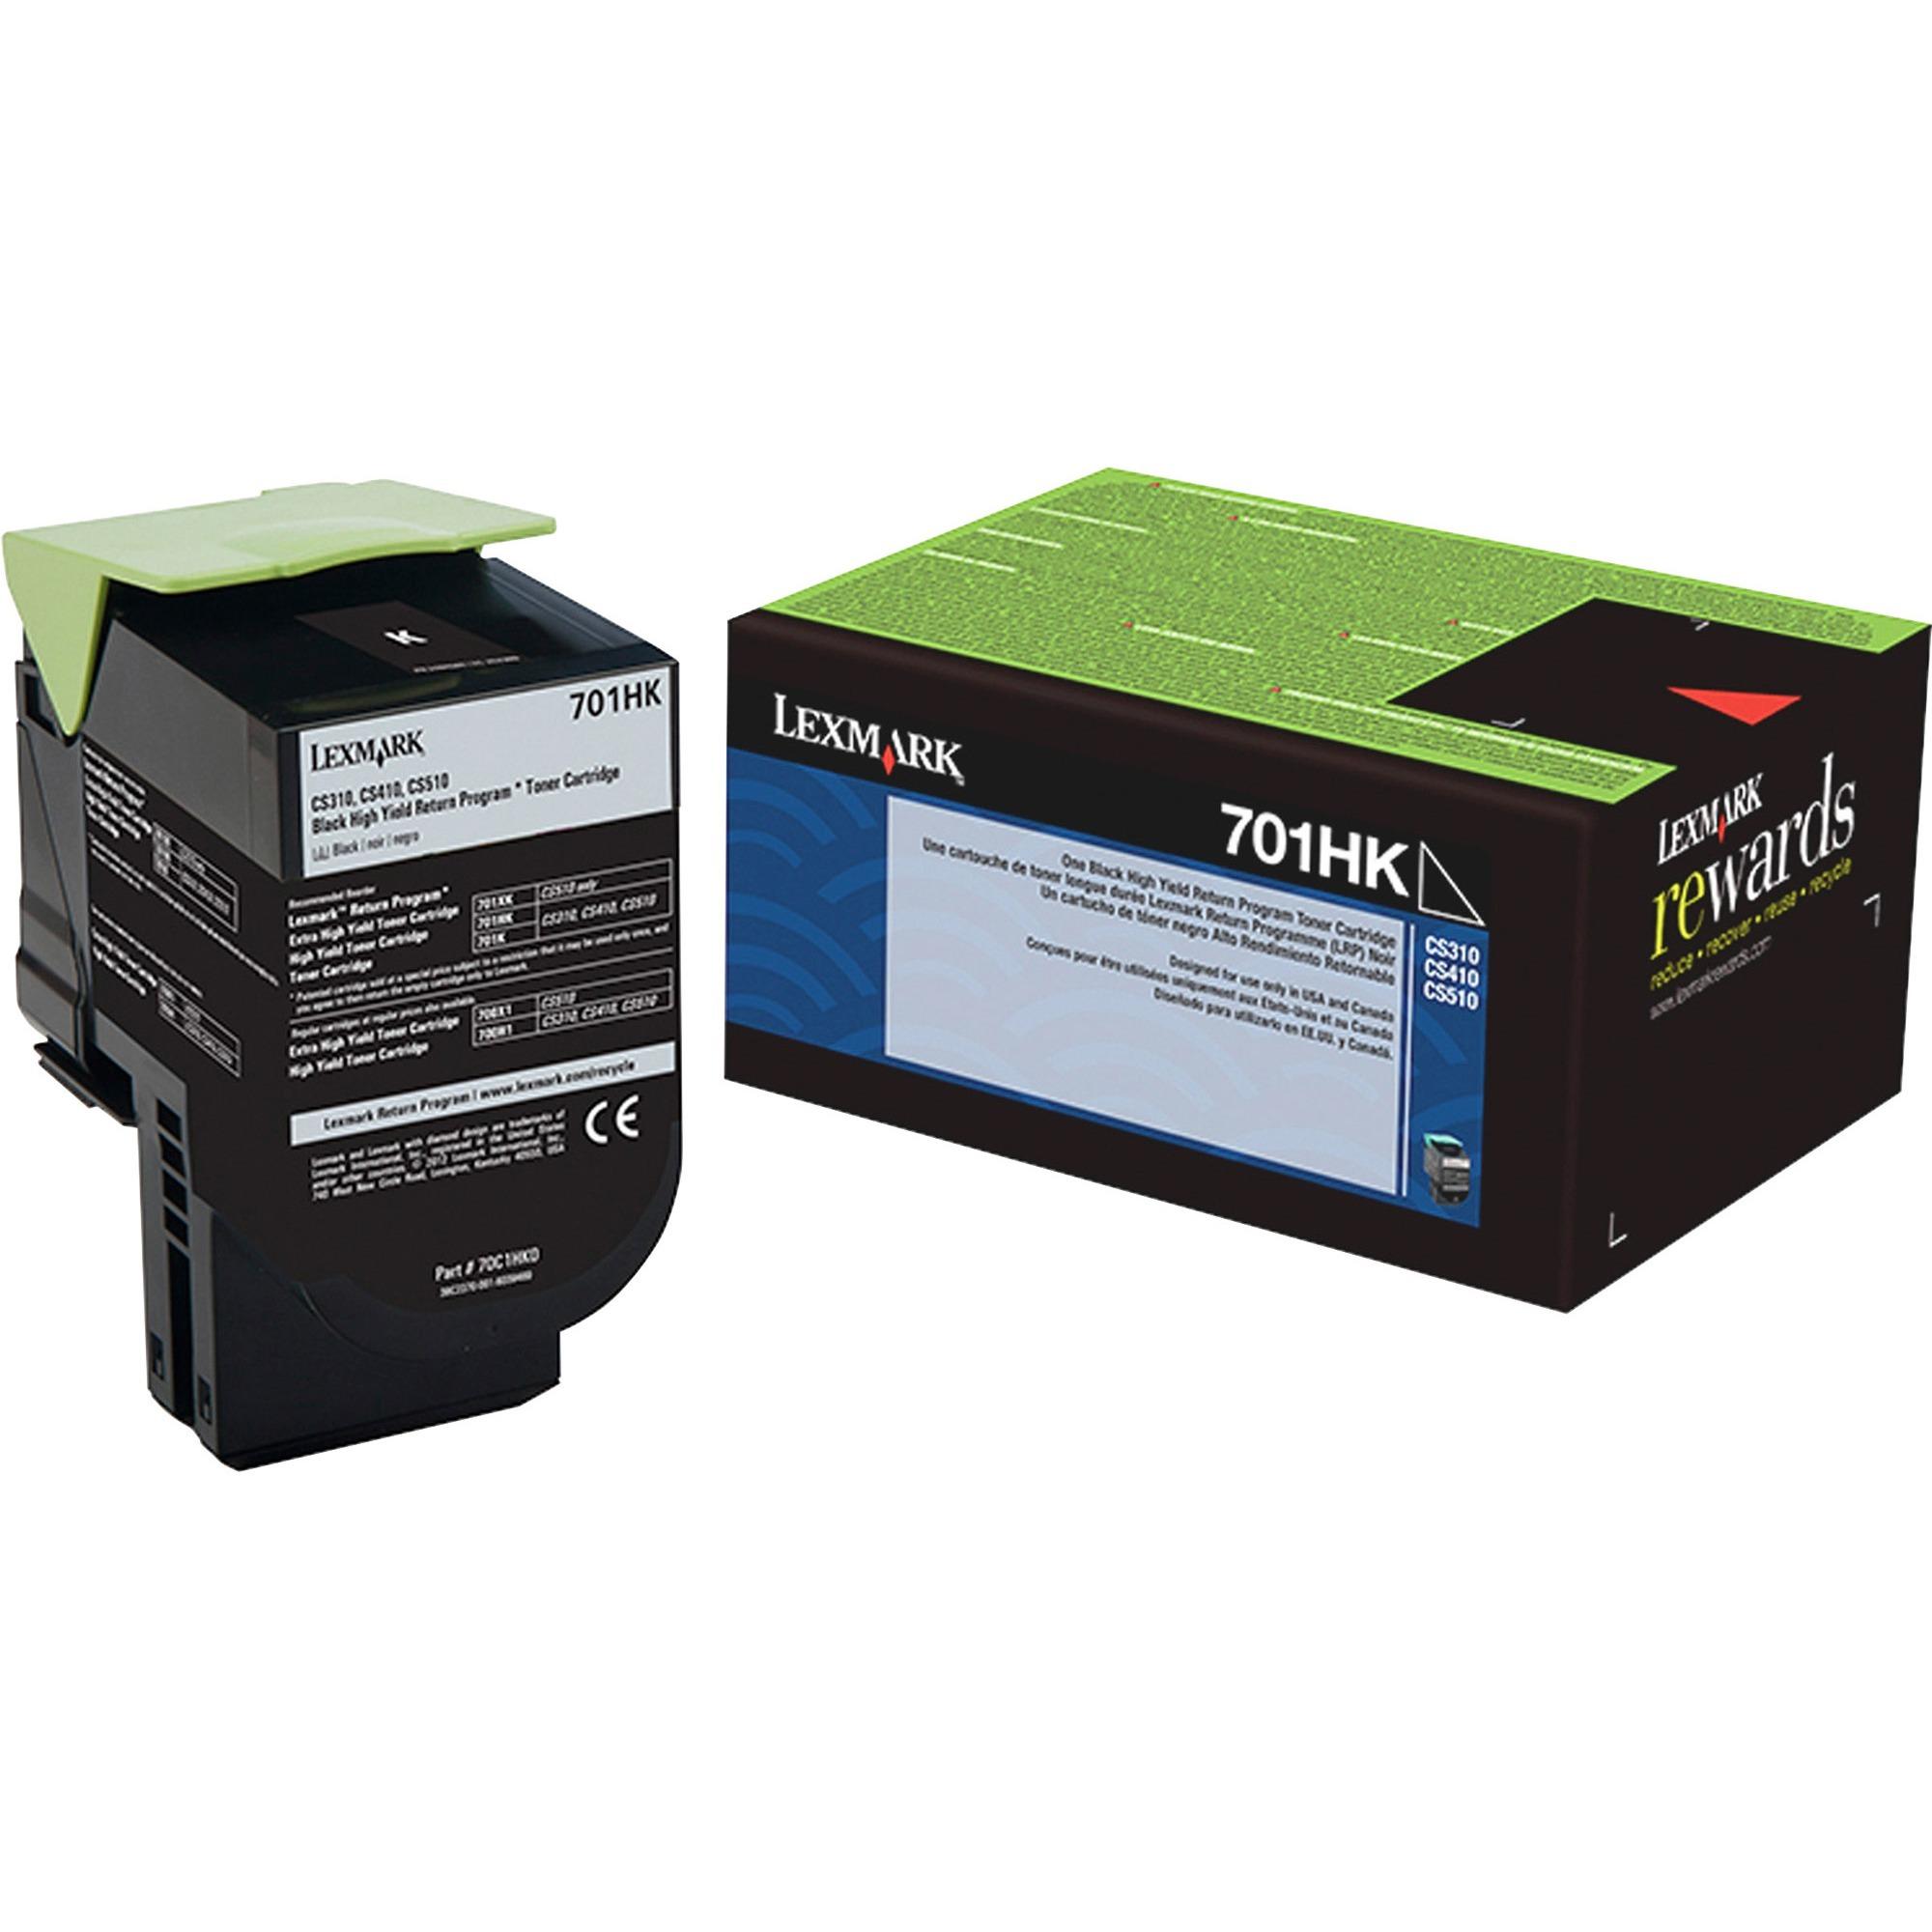 Lexmark, LEX70C1HK0, 70C1H Toner Cartridge, 1 Each